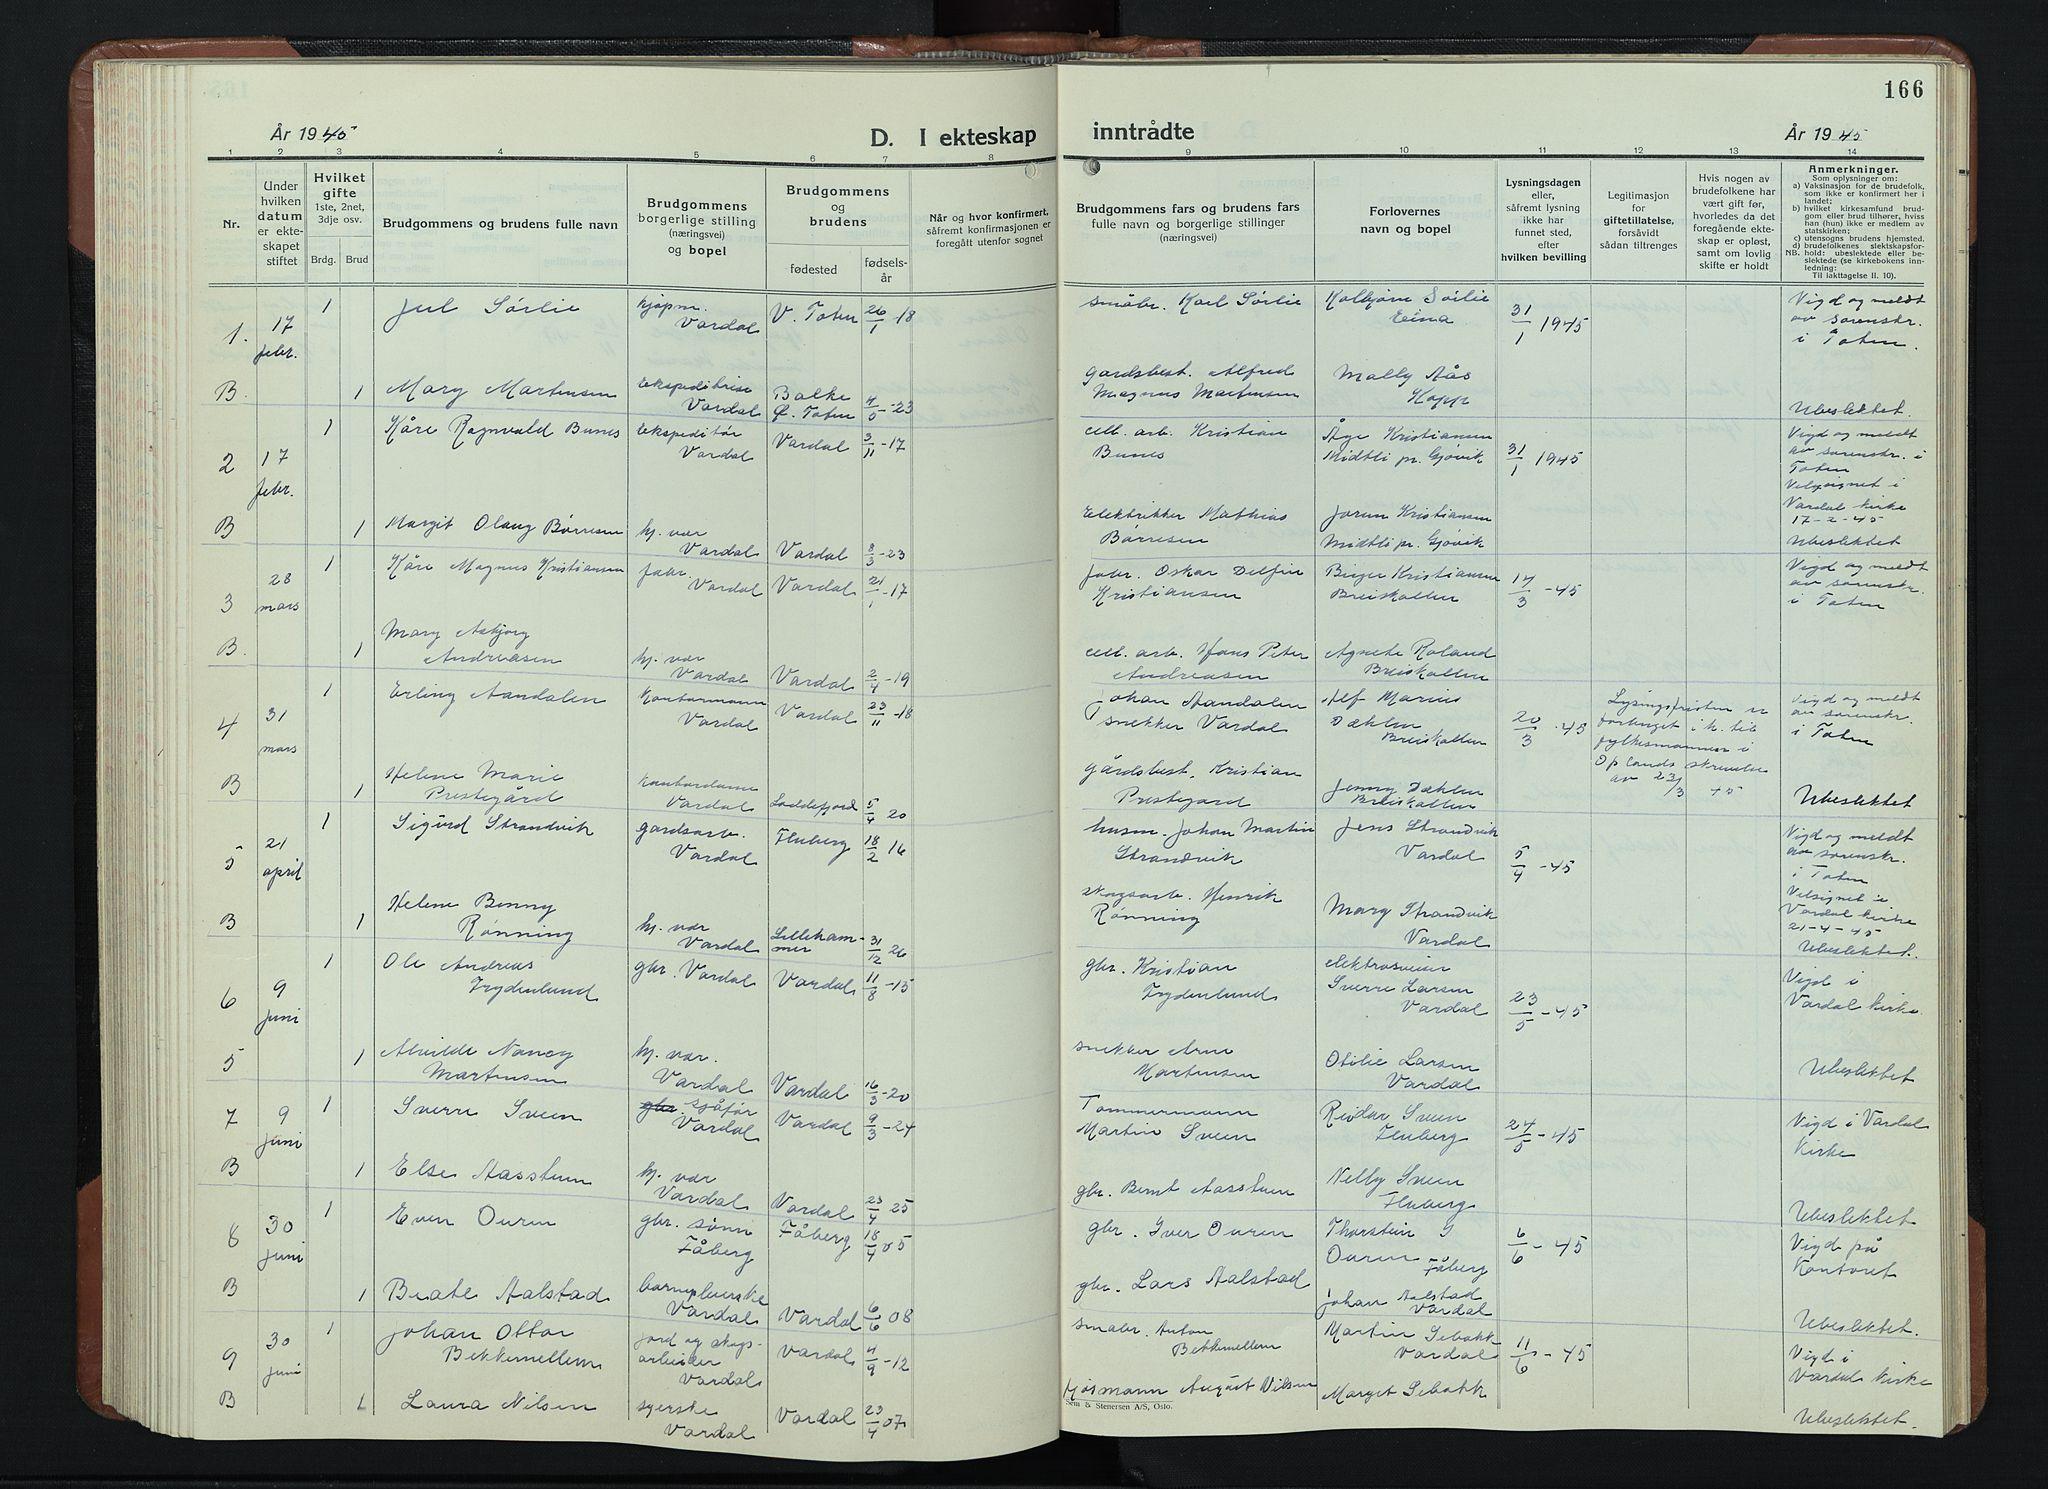 SAH, Vardal prestekontor, H/Ha/Hab/L0018: Klokkerbok nr. 18, 1931-1951, s. 166